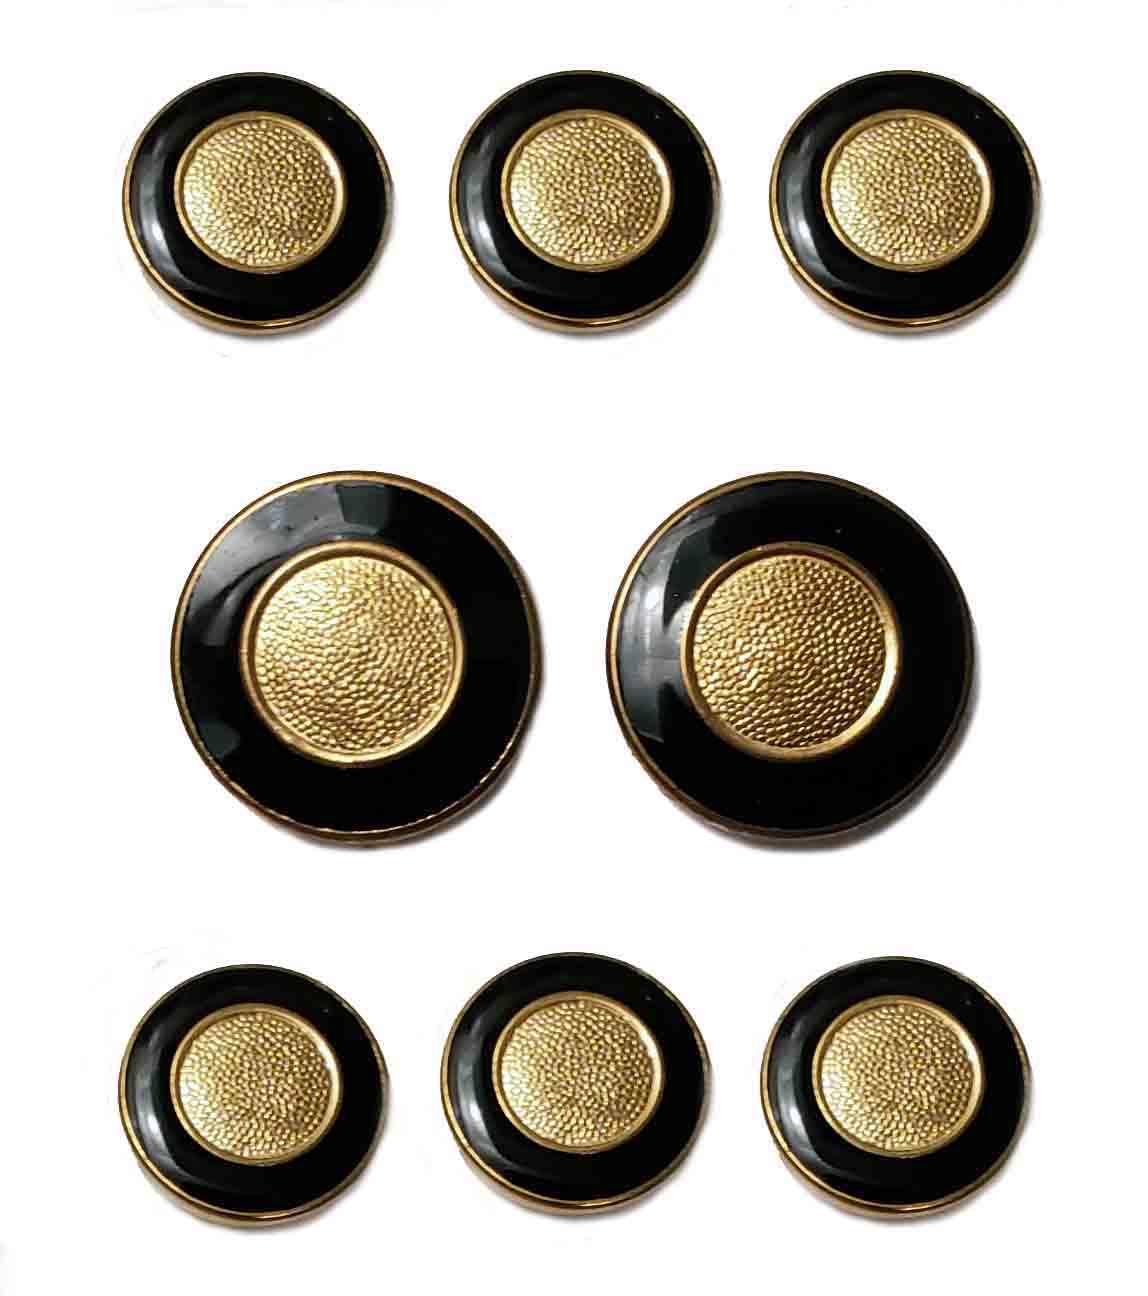 Vintage Stanley Blacker Blazer Buttons Set Gold Black Brass Enamel Shank Men's